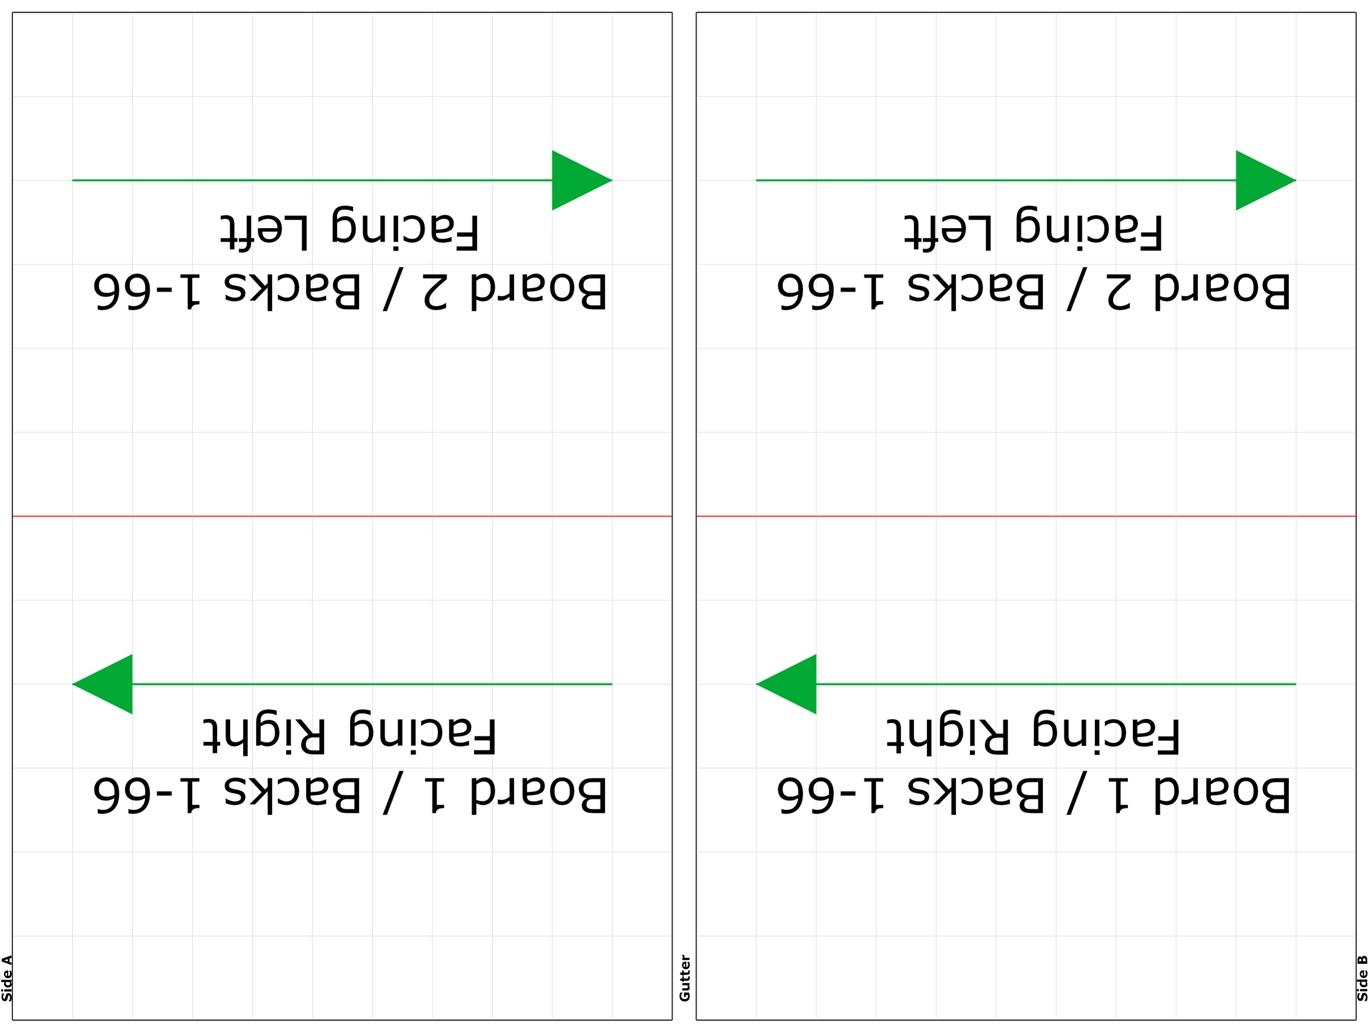 264_PrintSheet_SoupySalesBacks02sm.jpg